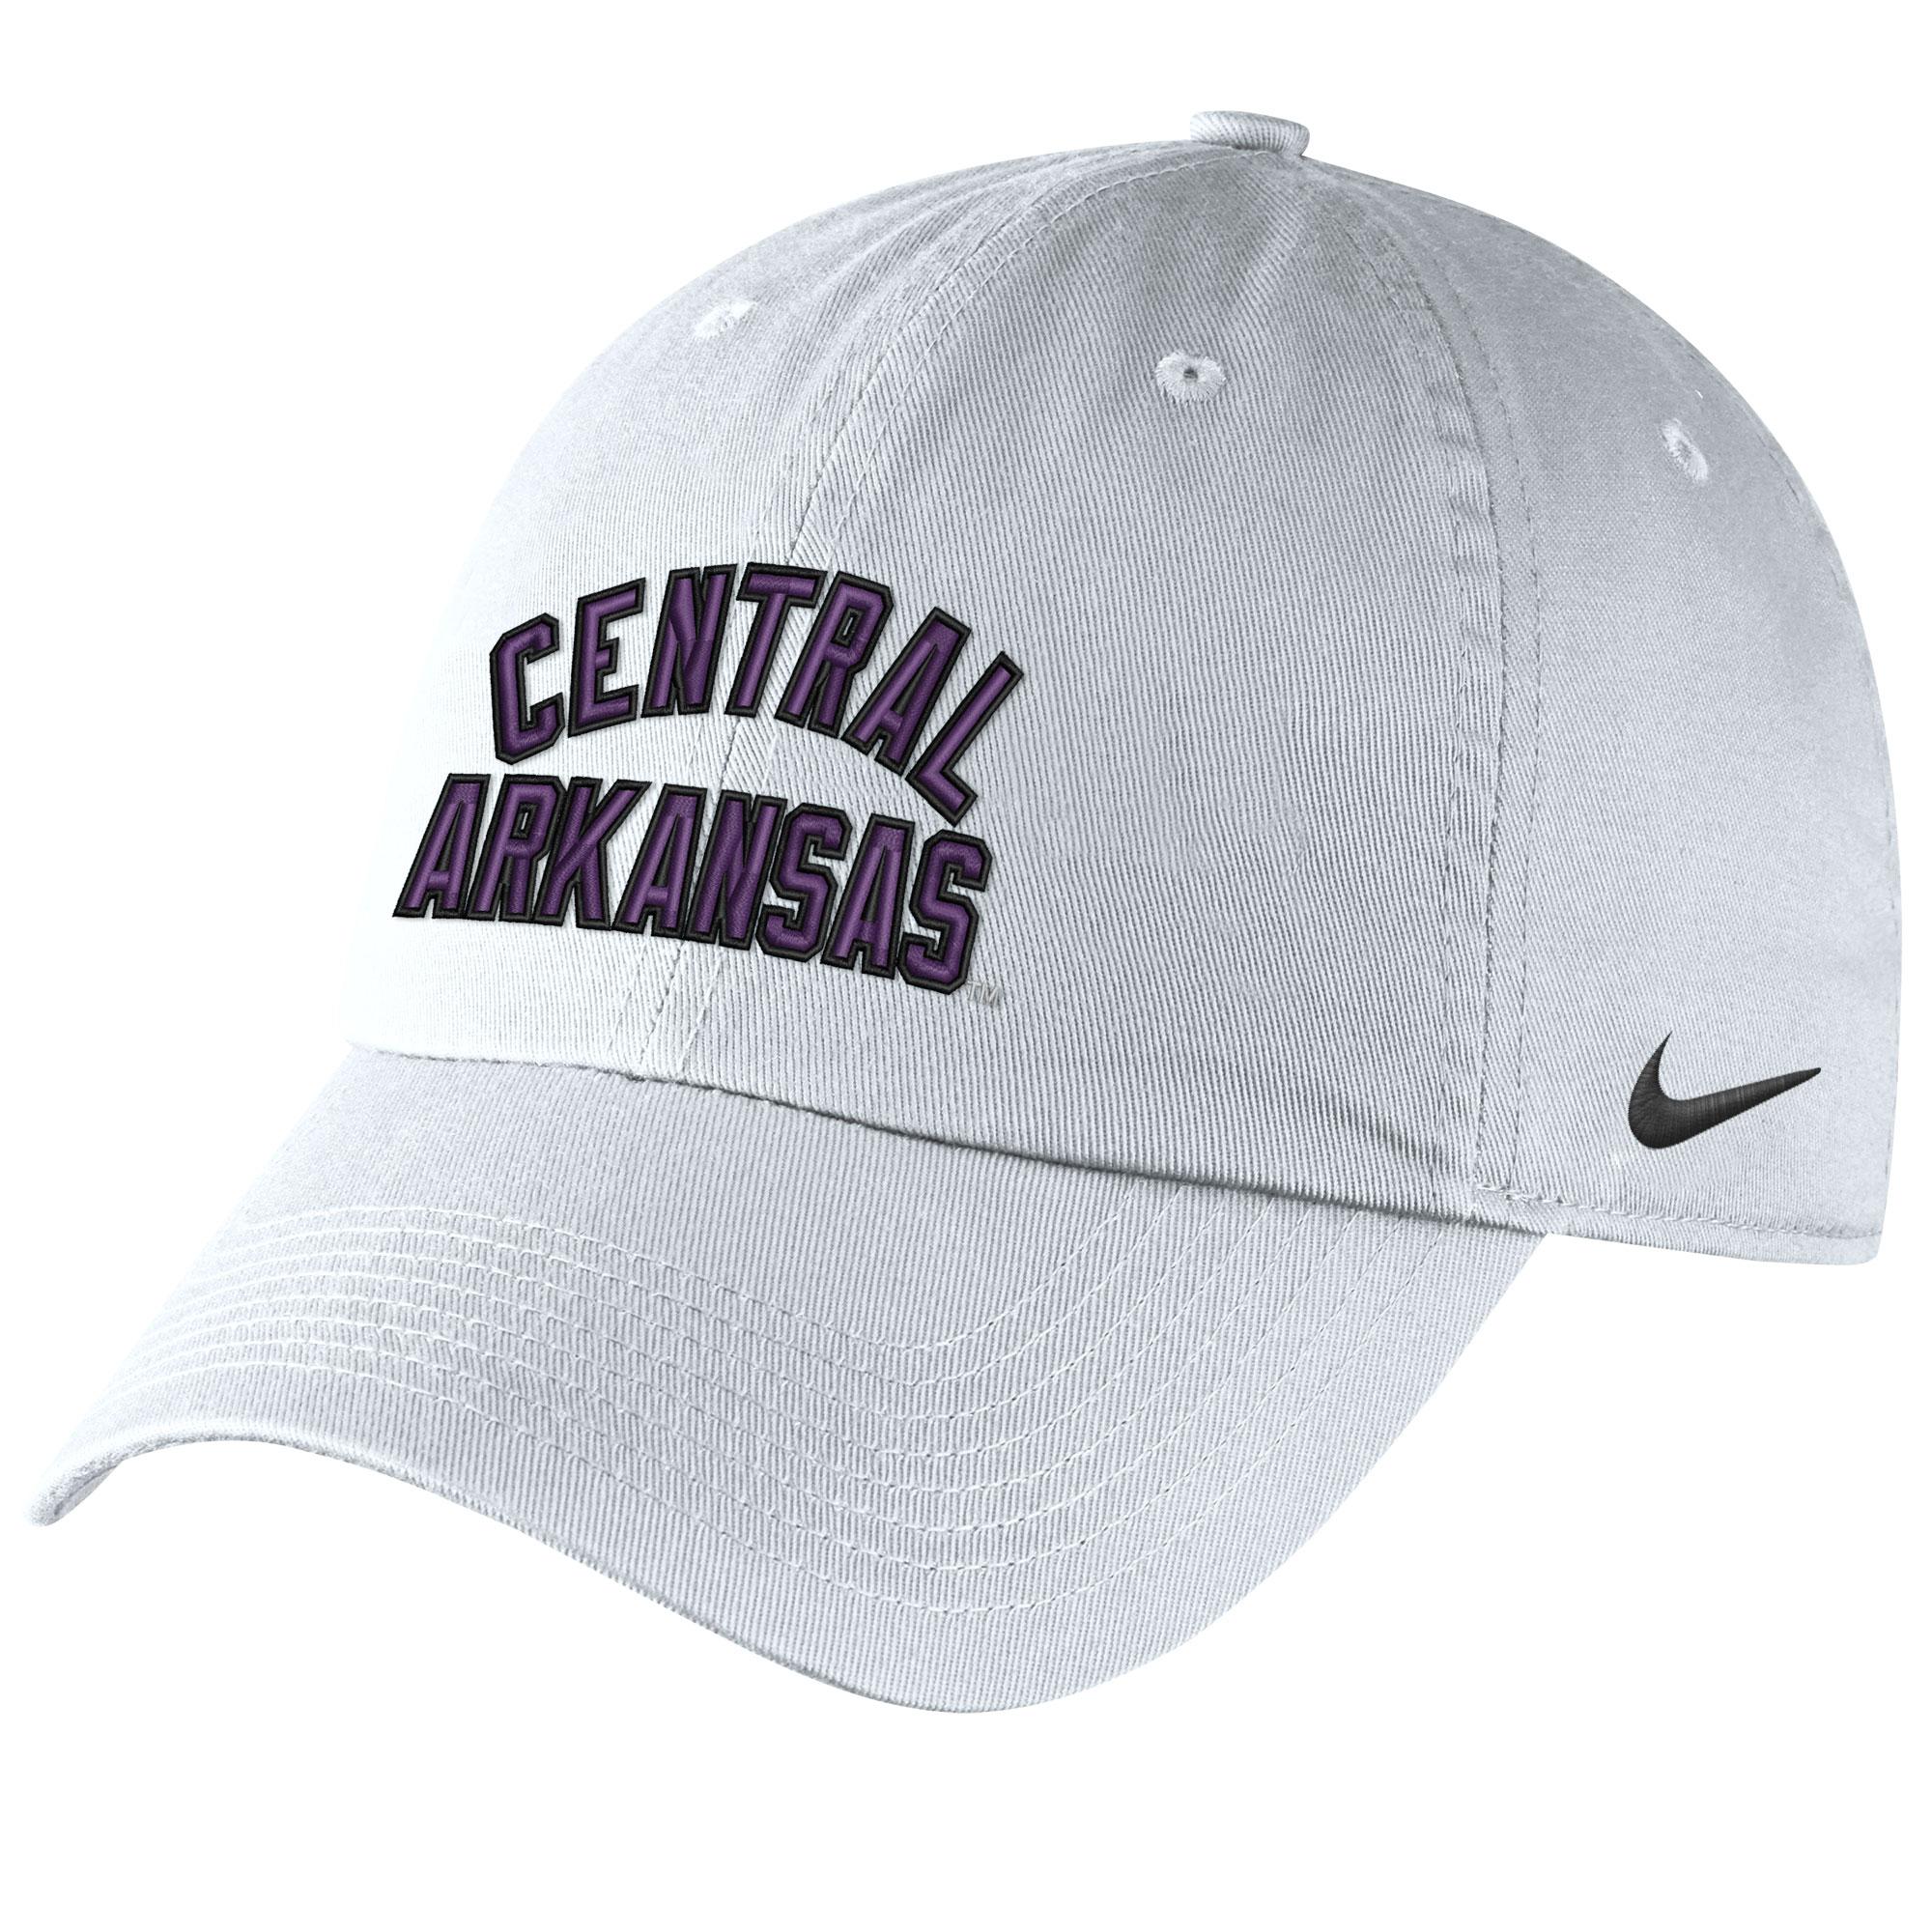 Central Arkansas Authentic Cap